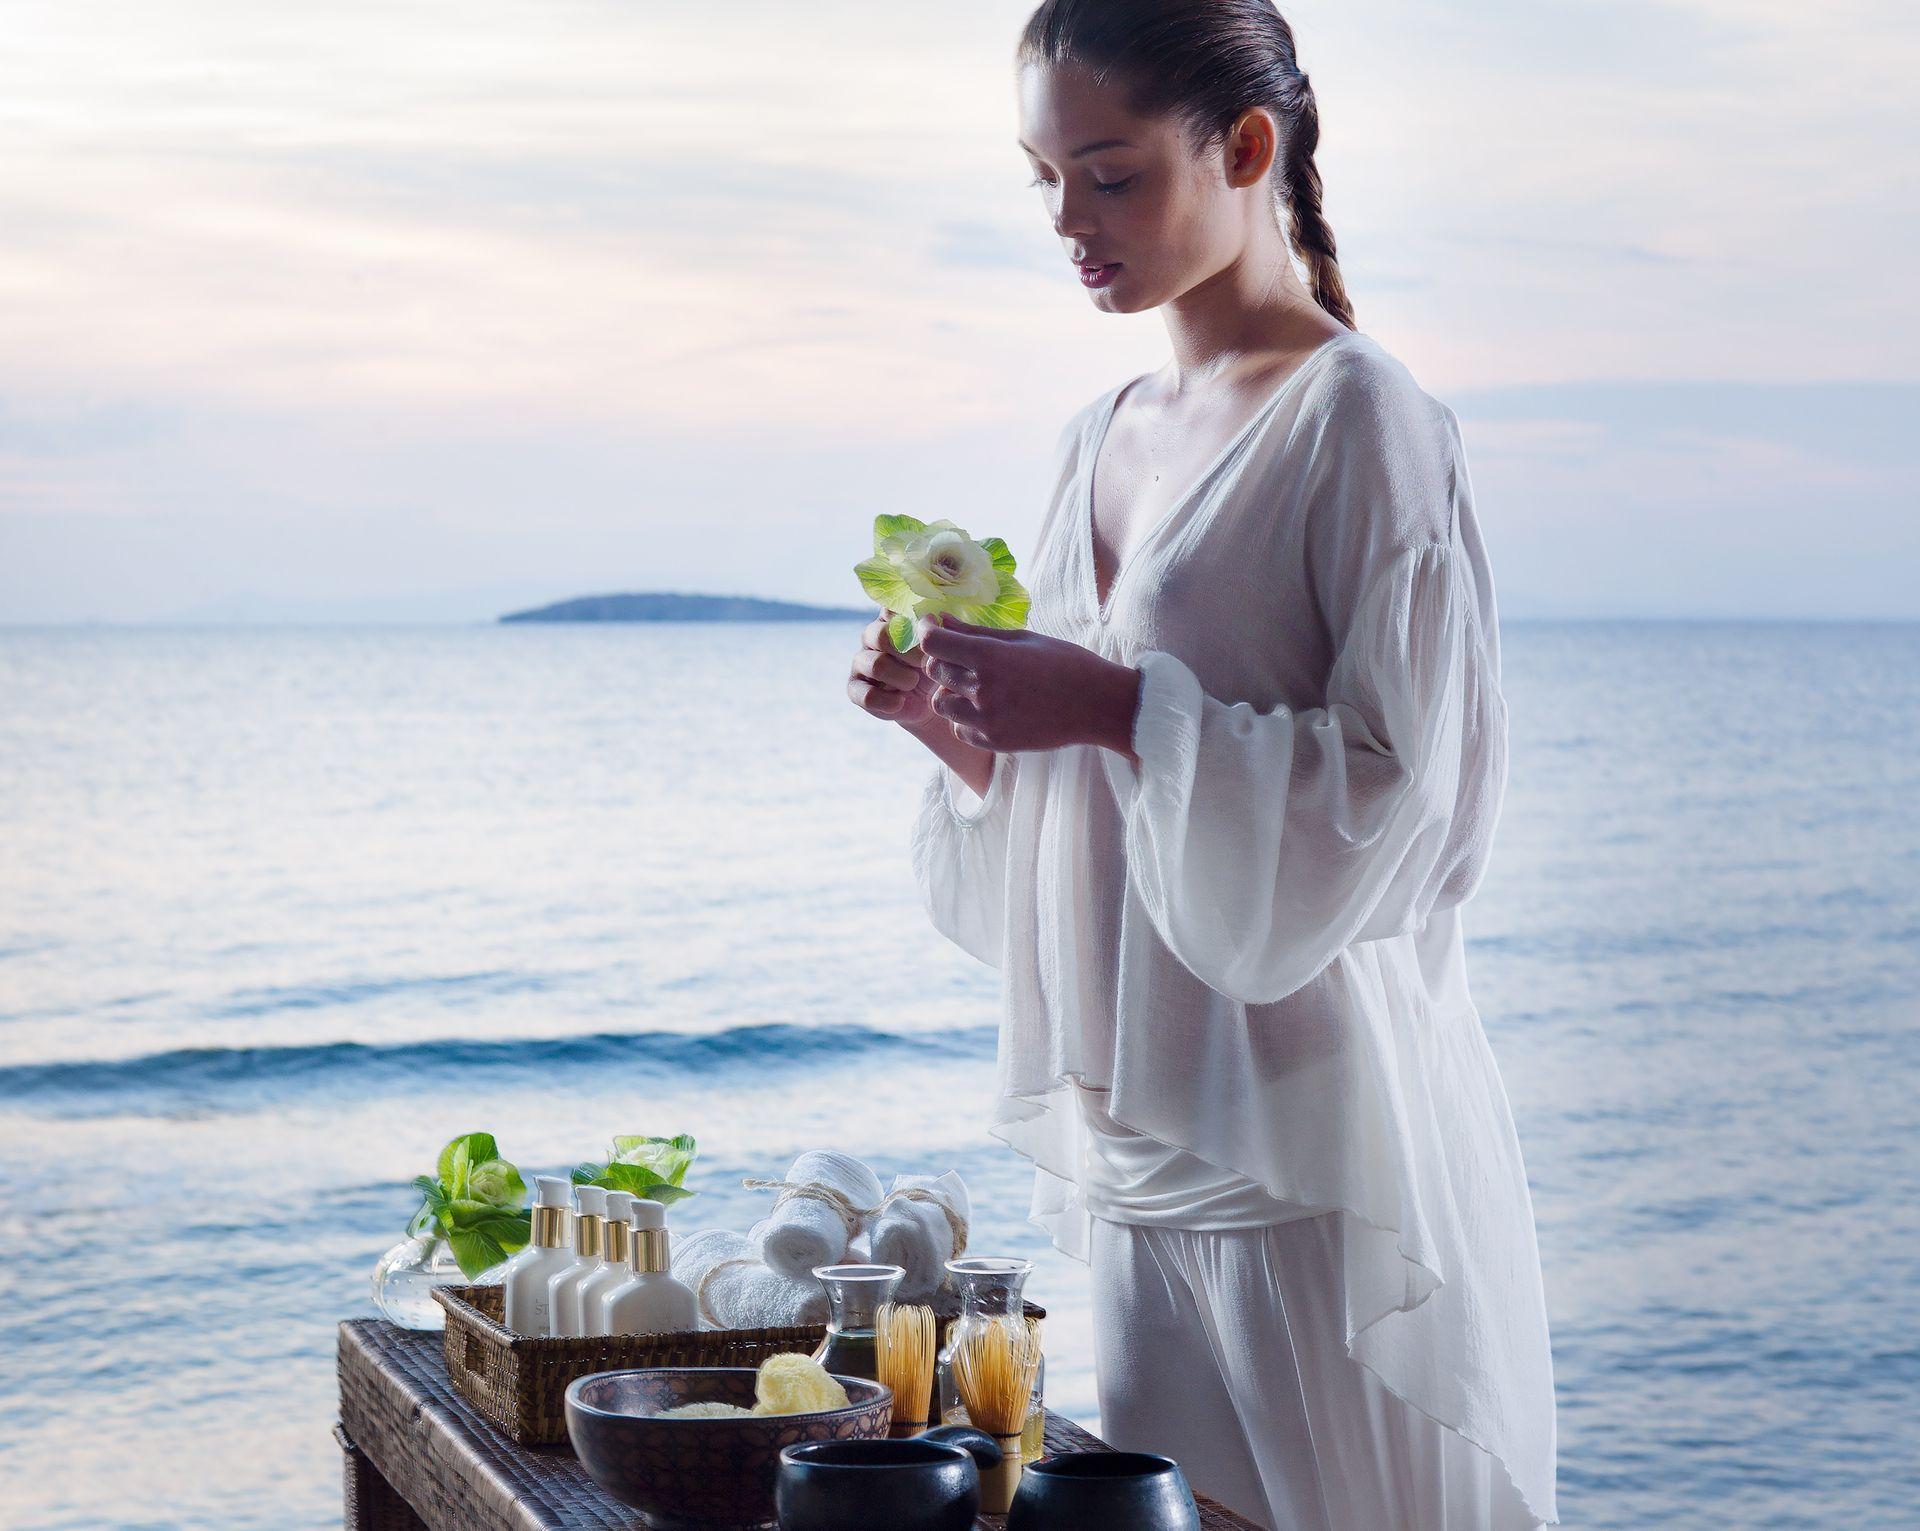 Divani Apollon Palace & Thalasso | Athens Riviera - Offers - #DivineYou Armonia Programs